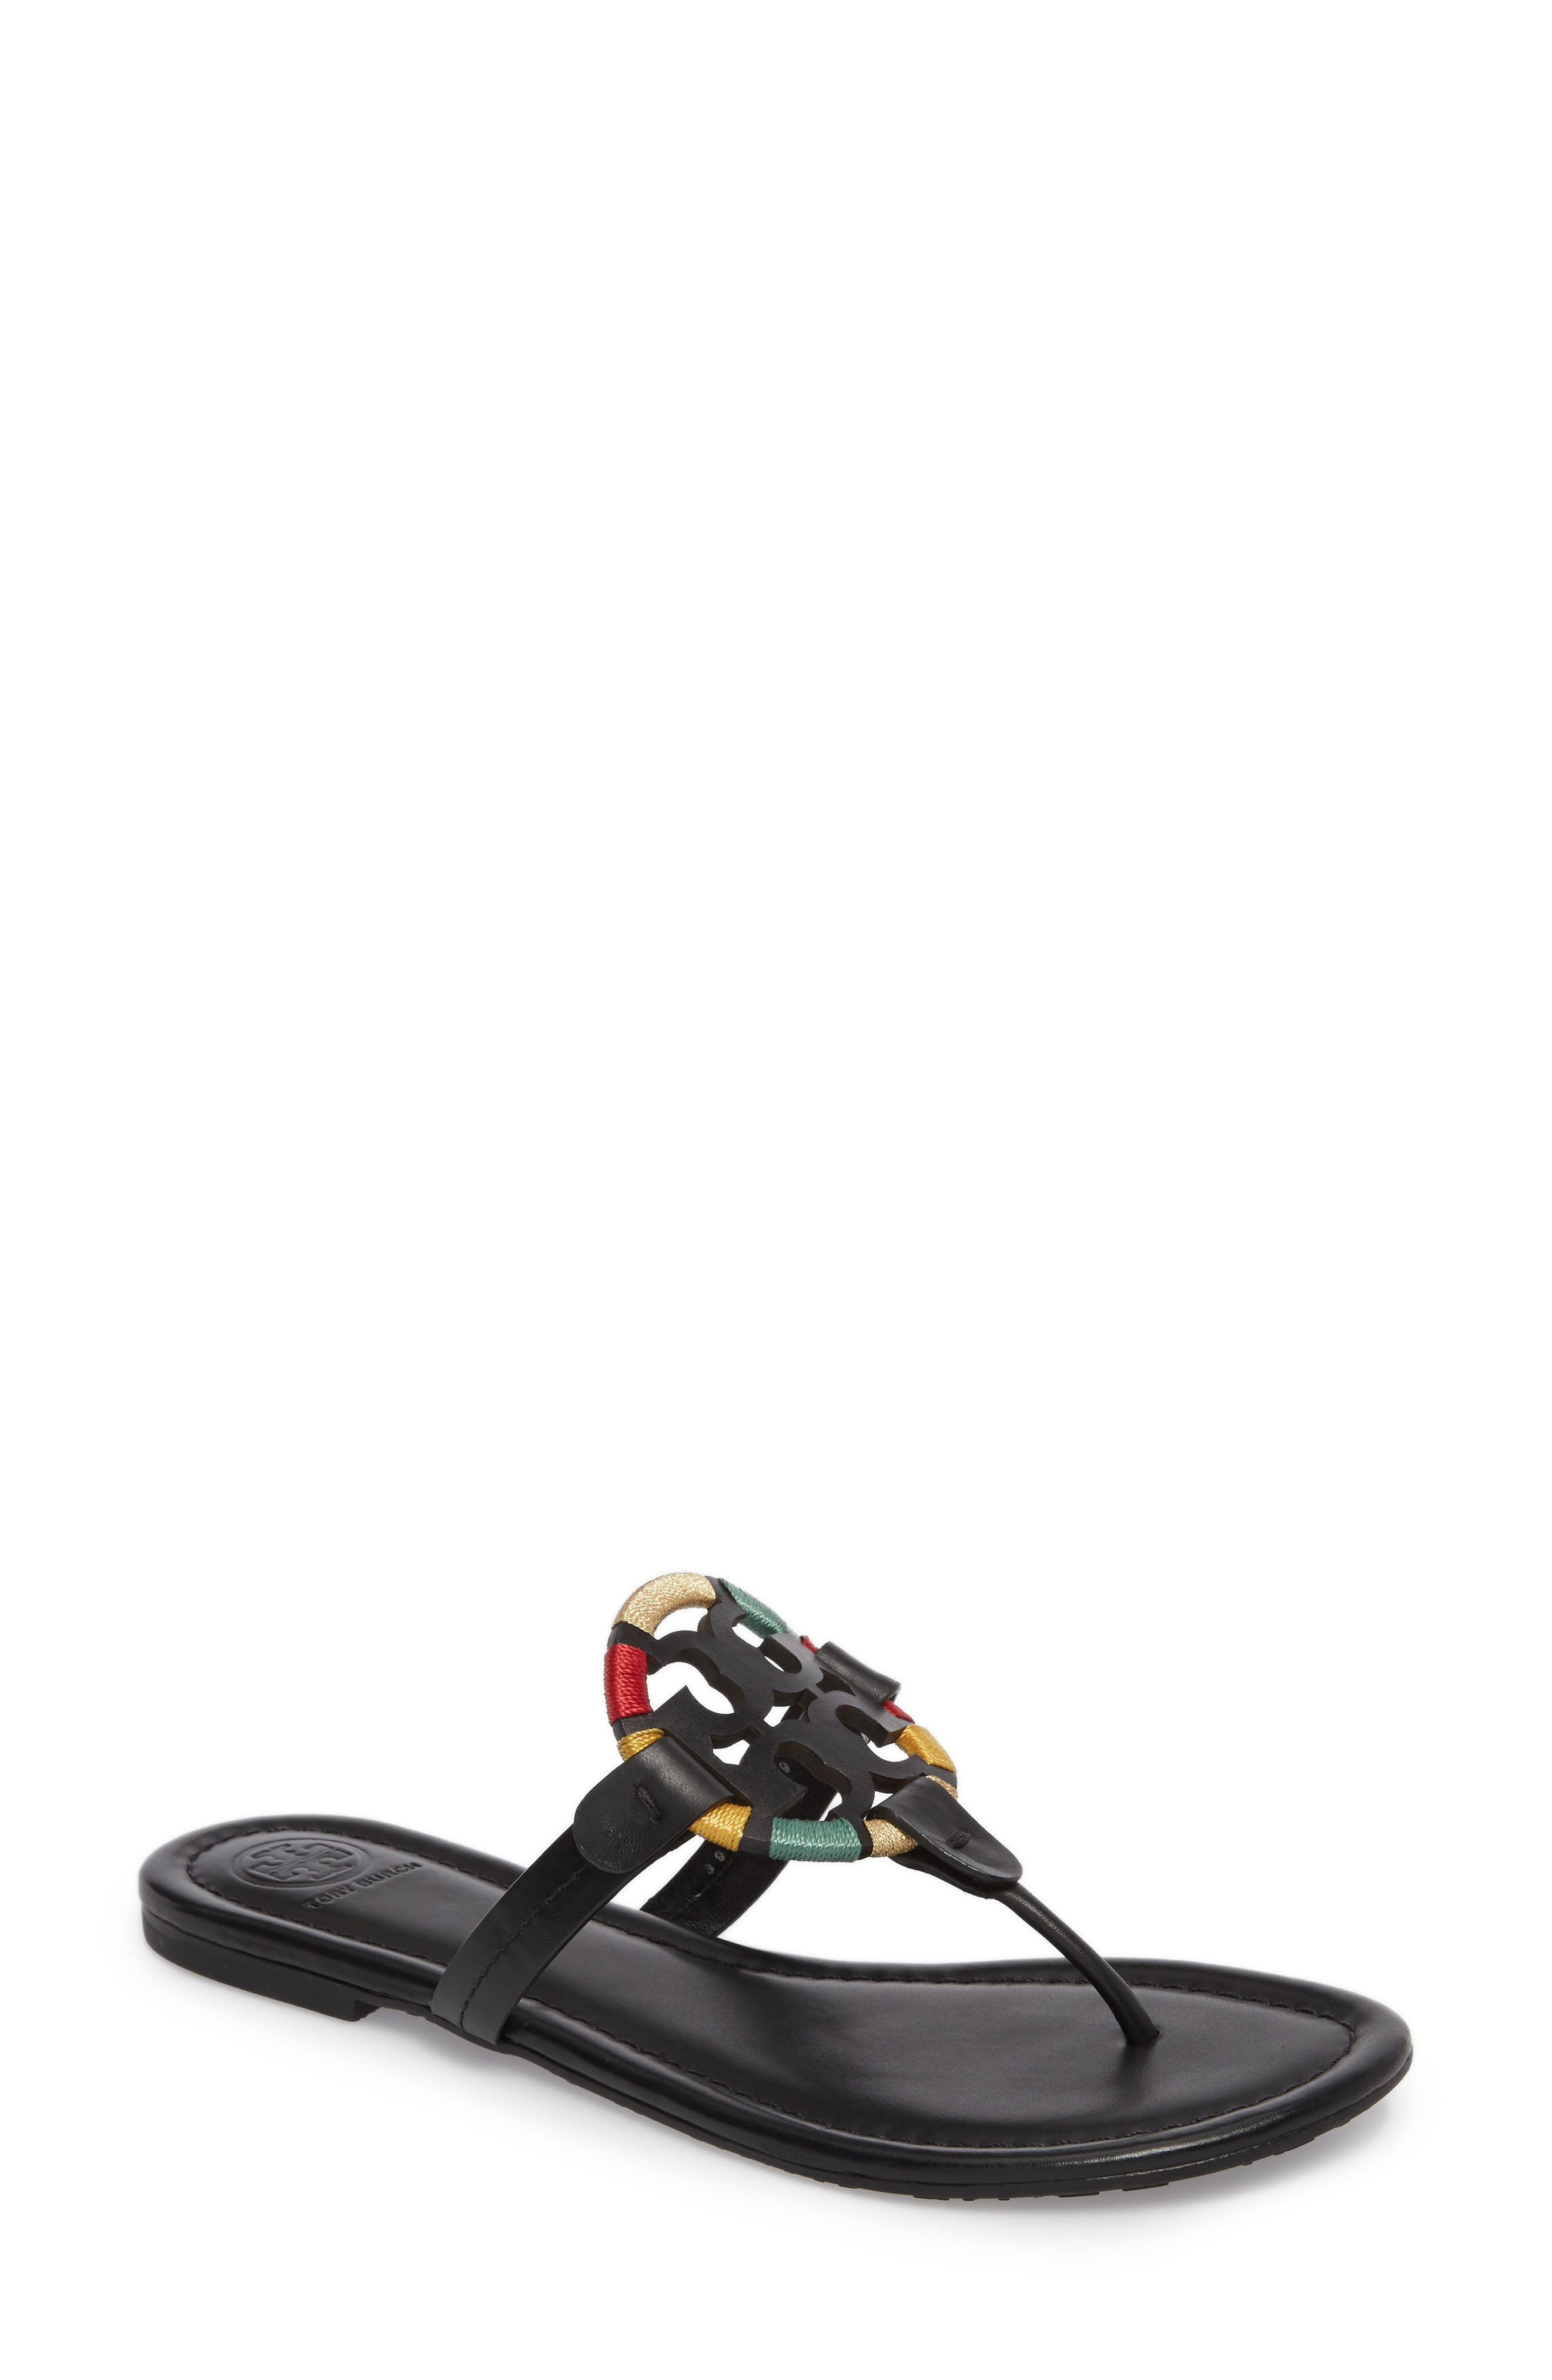 Miller Sandal,                             Main thumbnail 1, color,                             BLACK/ MULTI